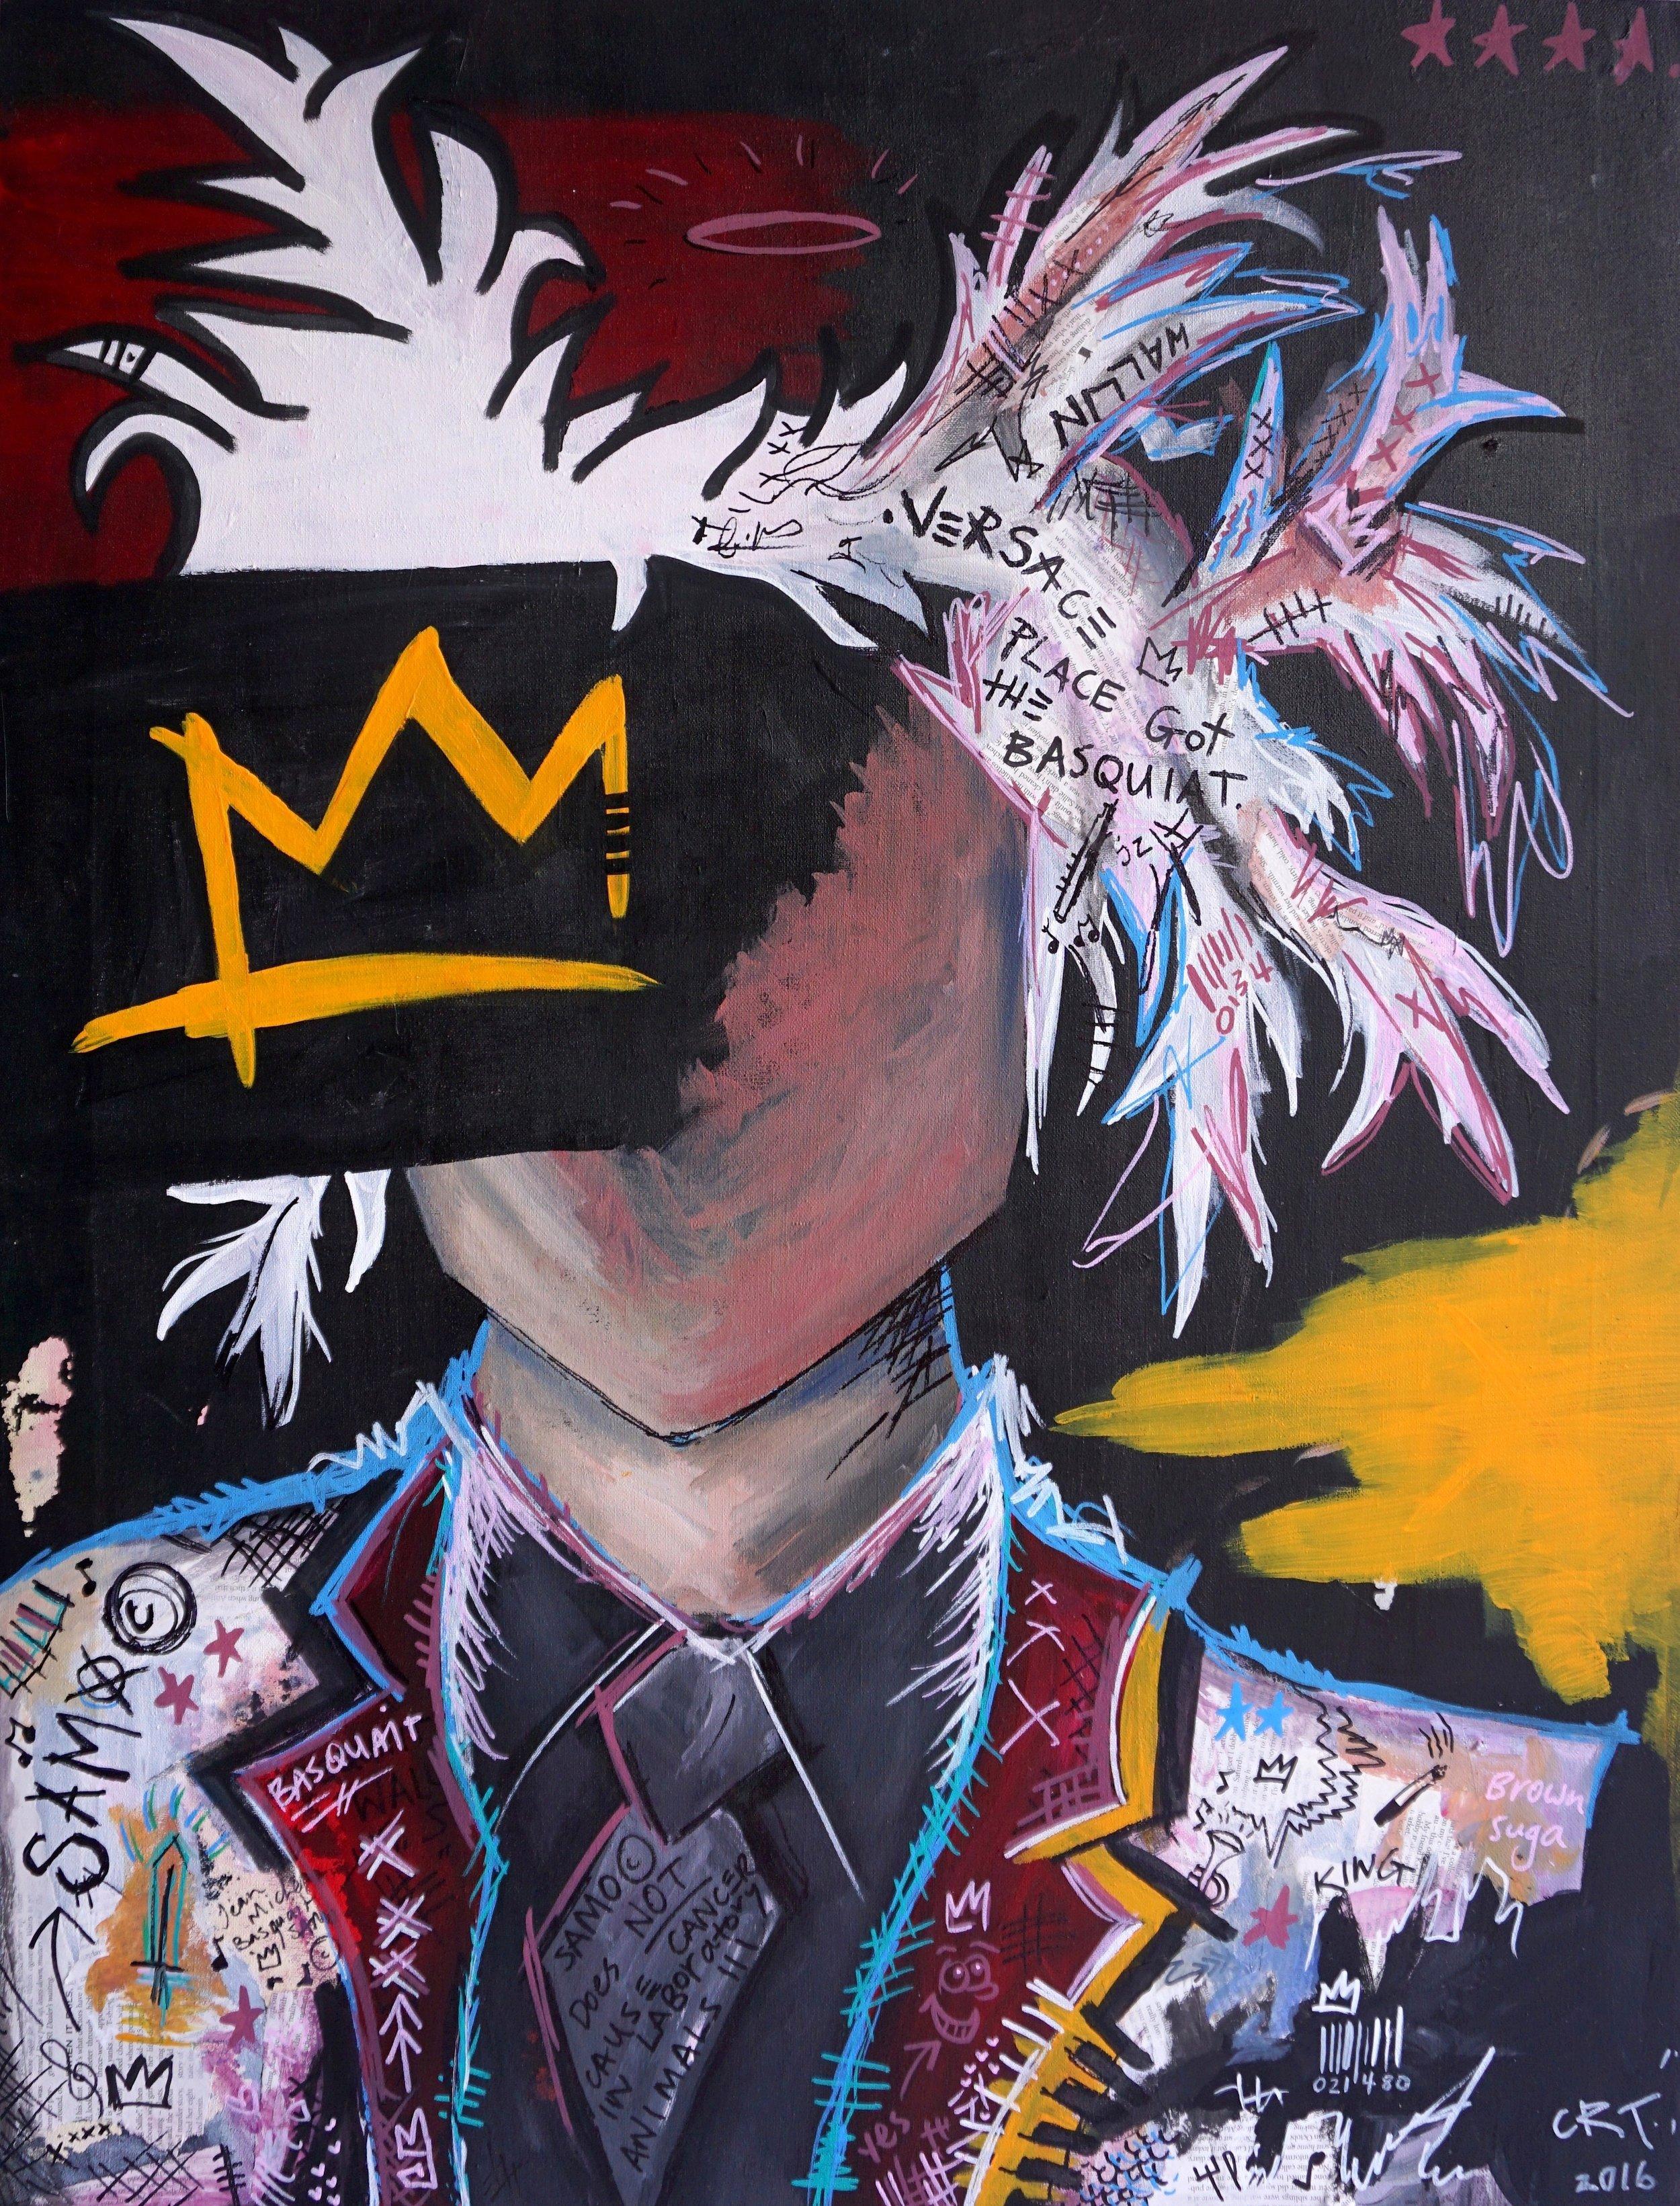 Got That Basquiat  70cm x 110cm Acrylic on Canvas 2016  Sold